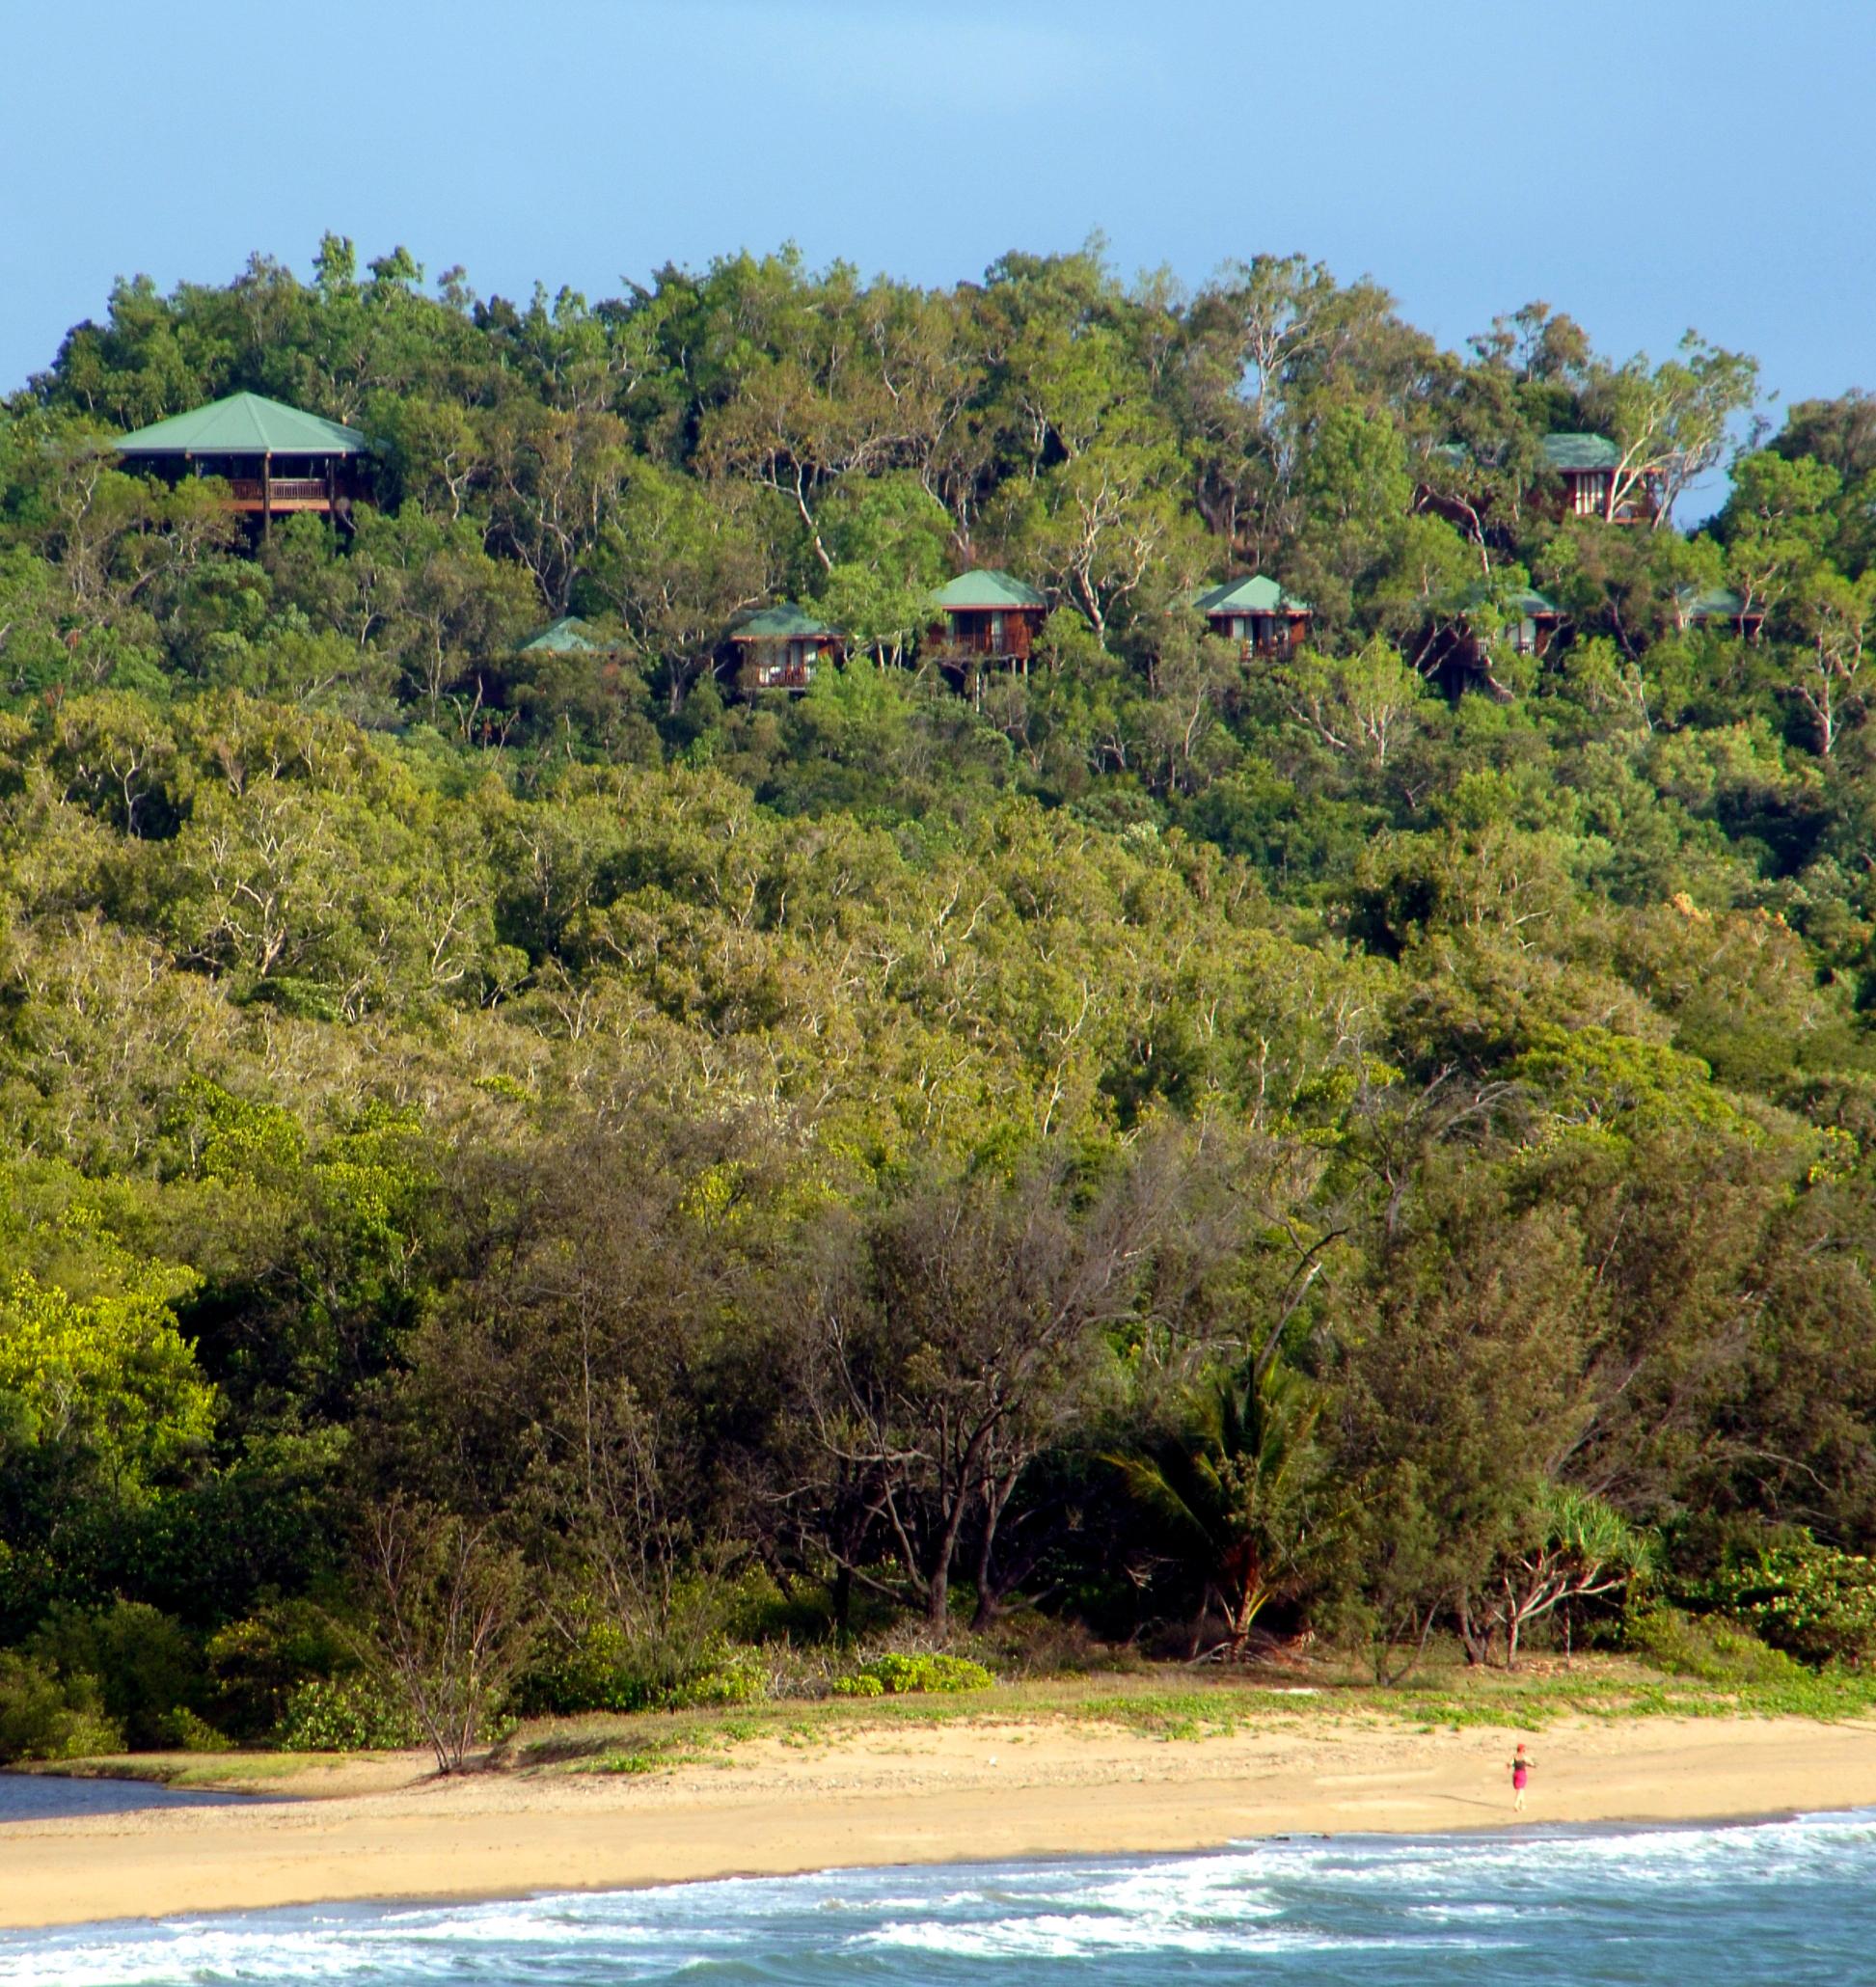 http://www.thalabeach.com.au/wp-content/uploads/2010/07/Thala_Beach_Lodge_0027.jpg